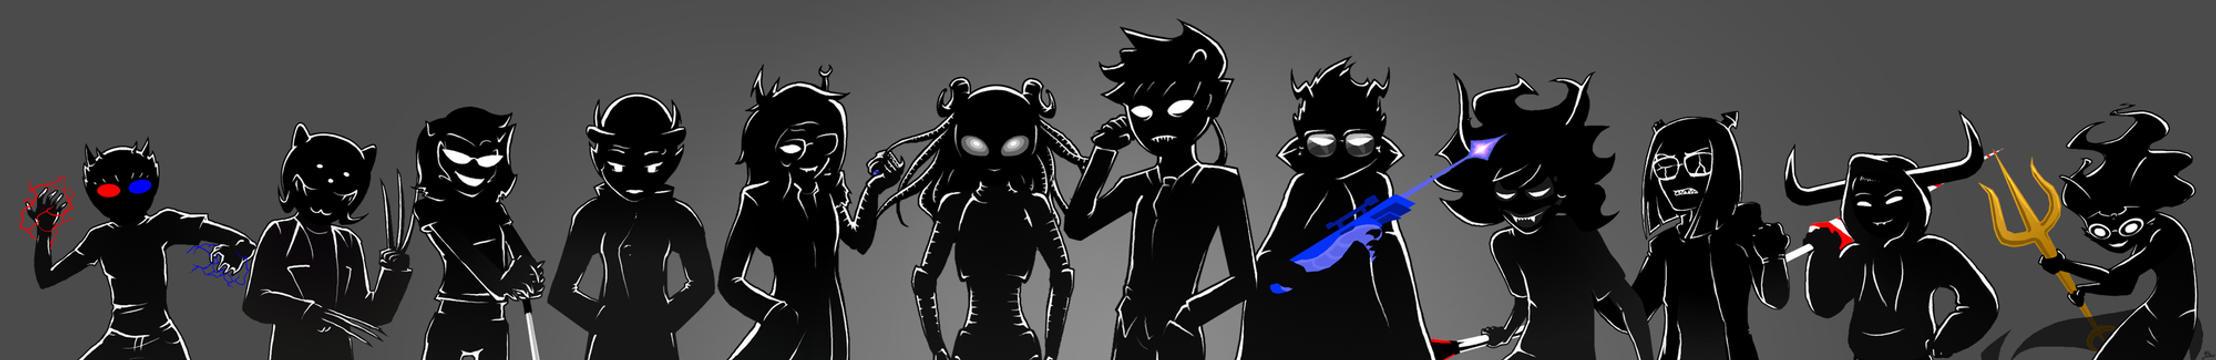 Midnight Crew Trolls by Biigurutwin